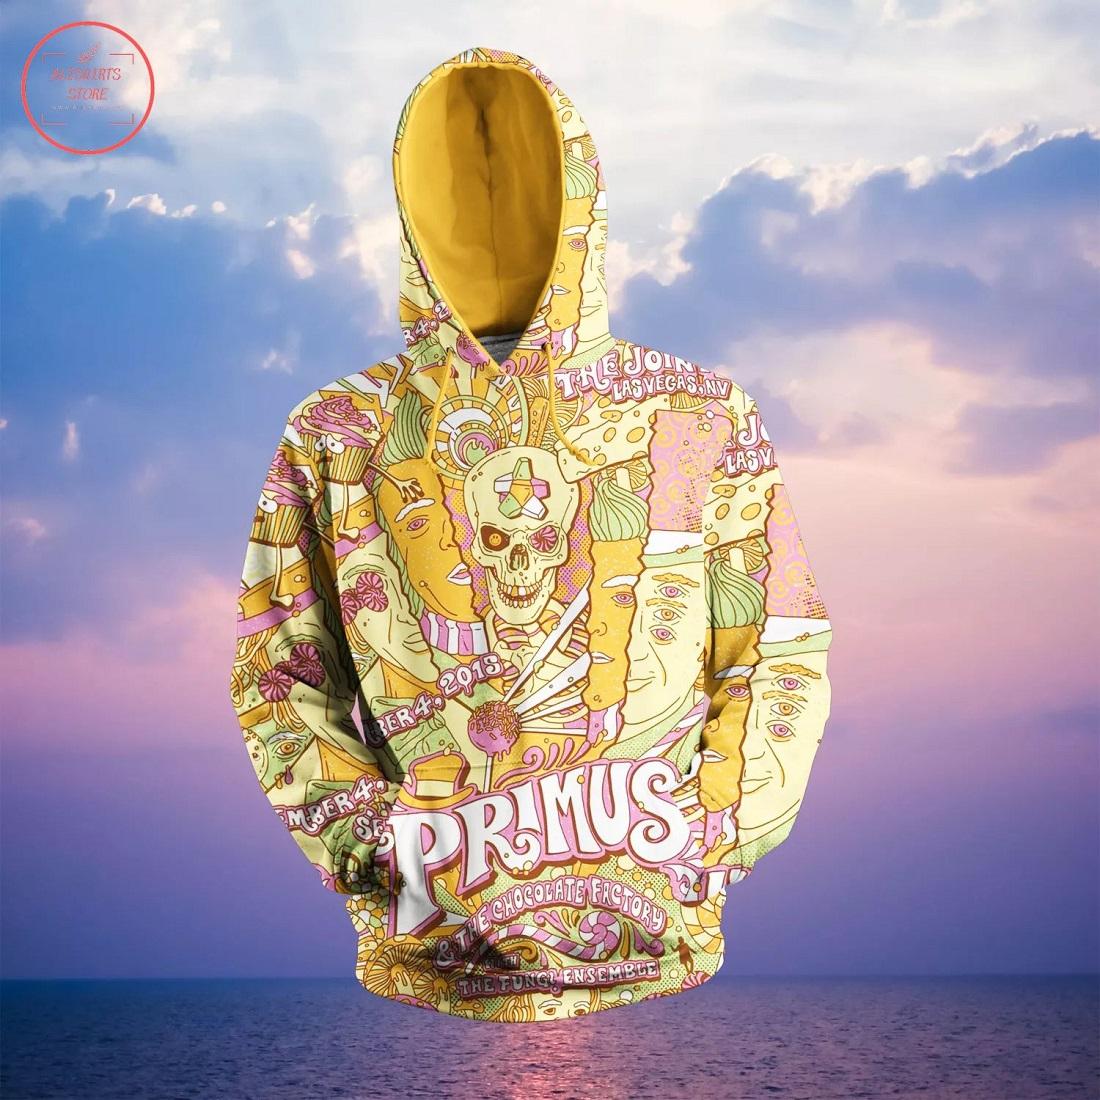 Primus Band 3D Hoodie